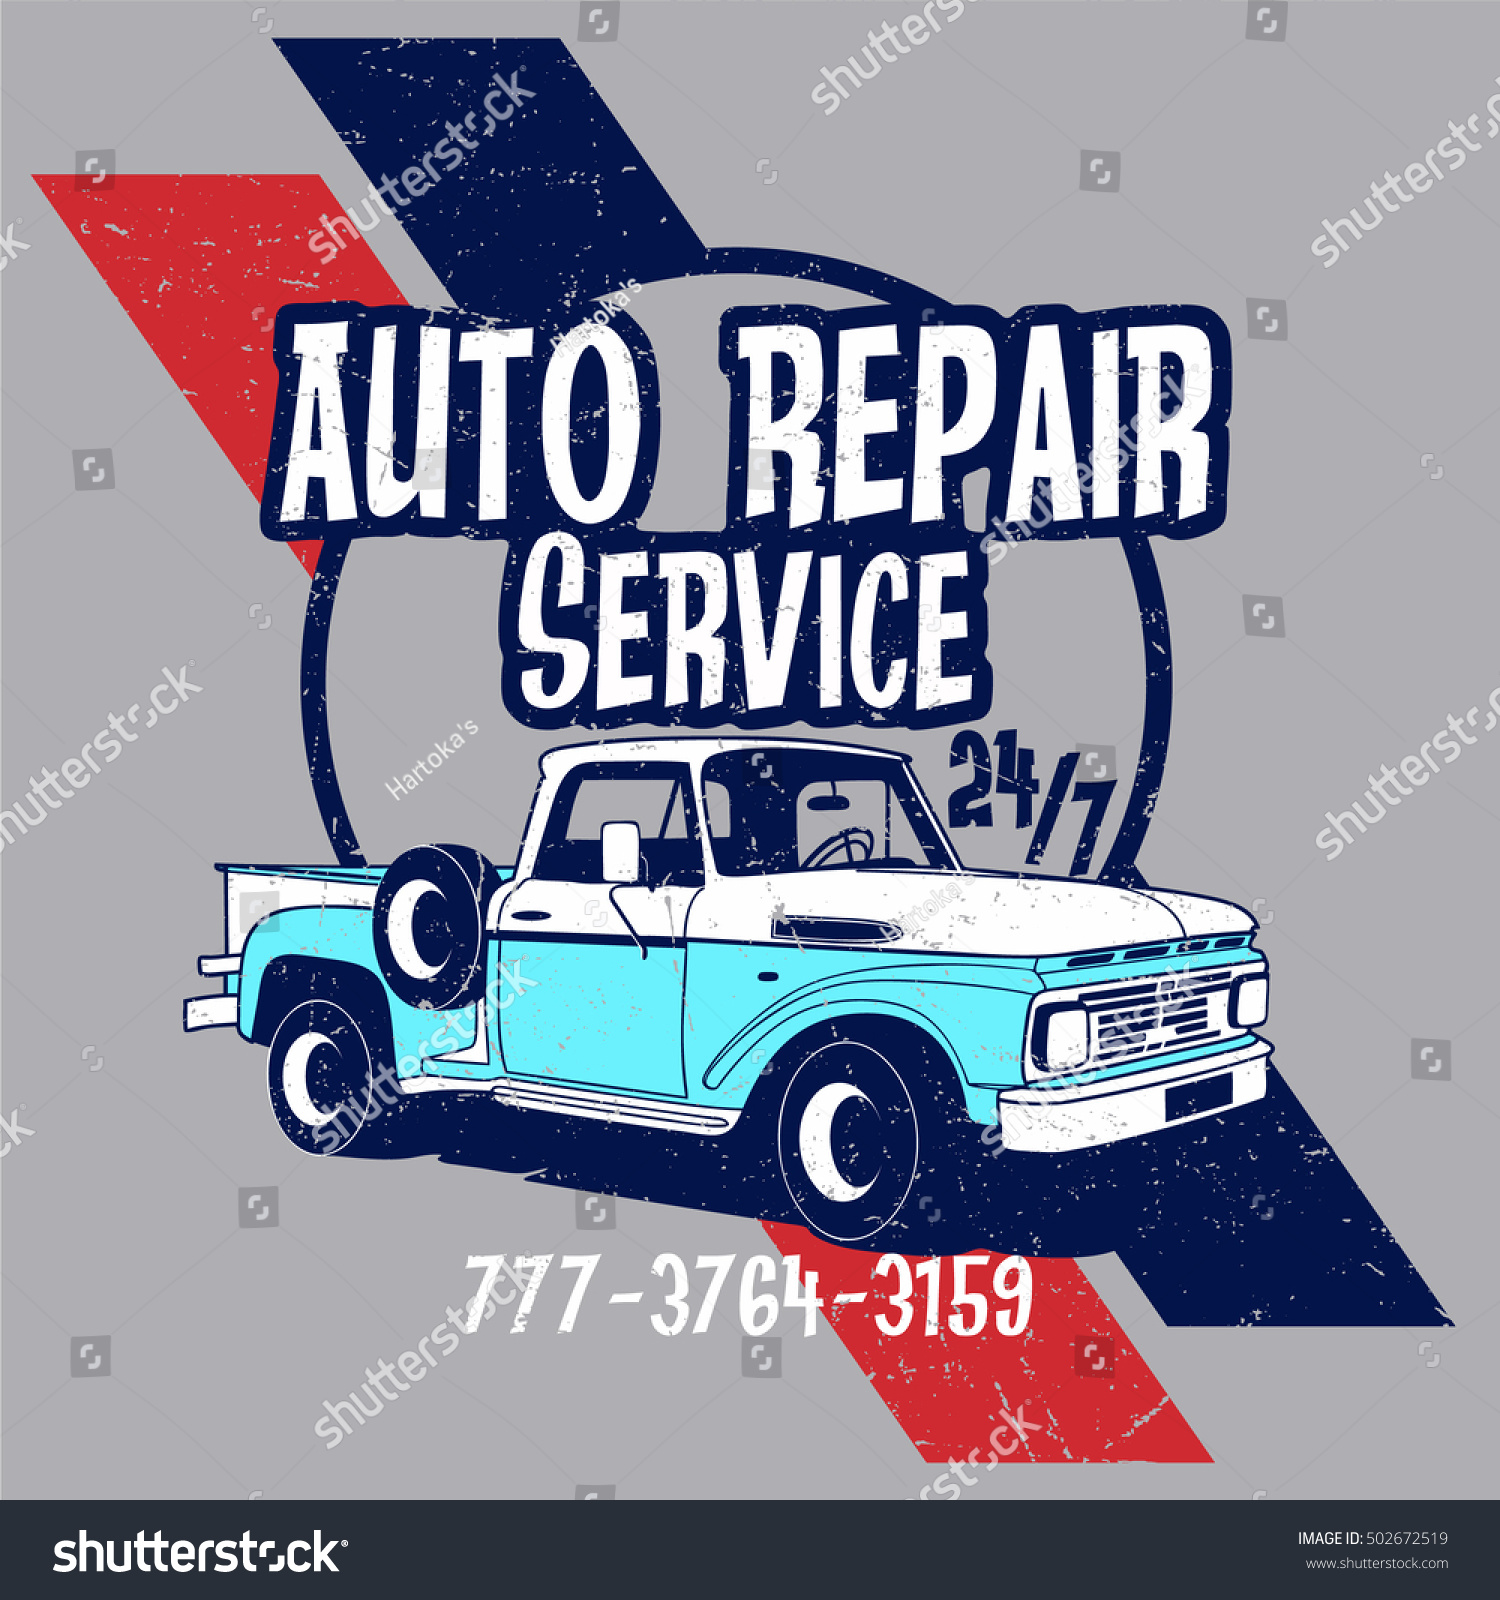 Auto repair service vector tshirt design stock vector for T shirt design service